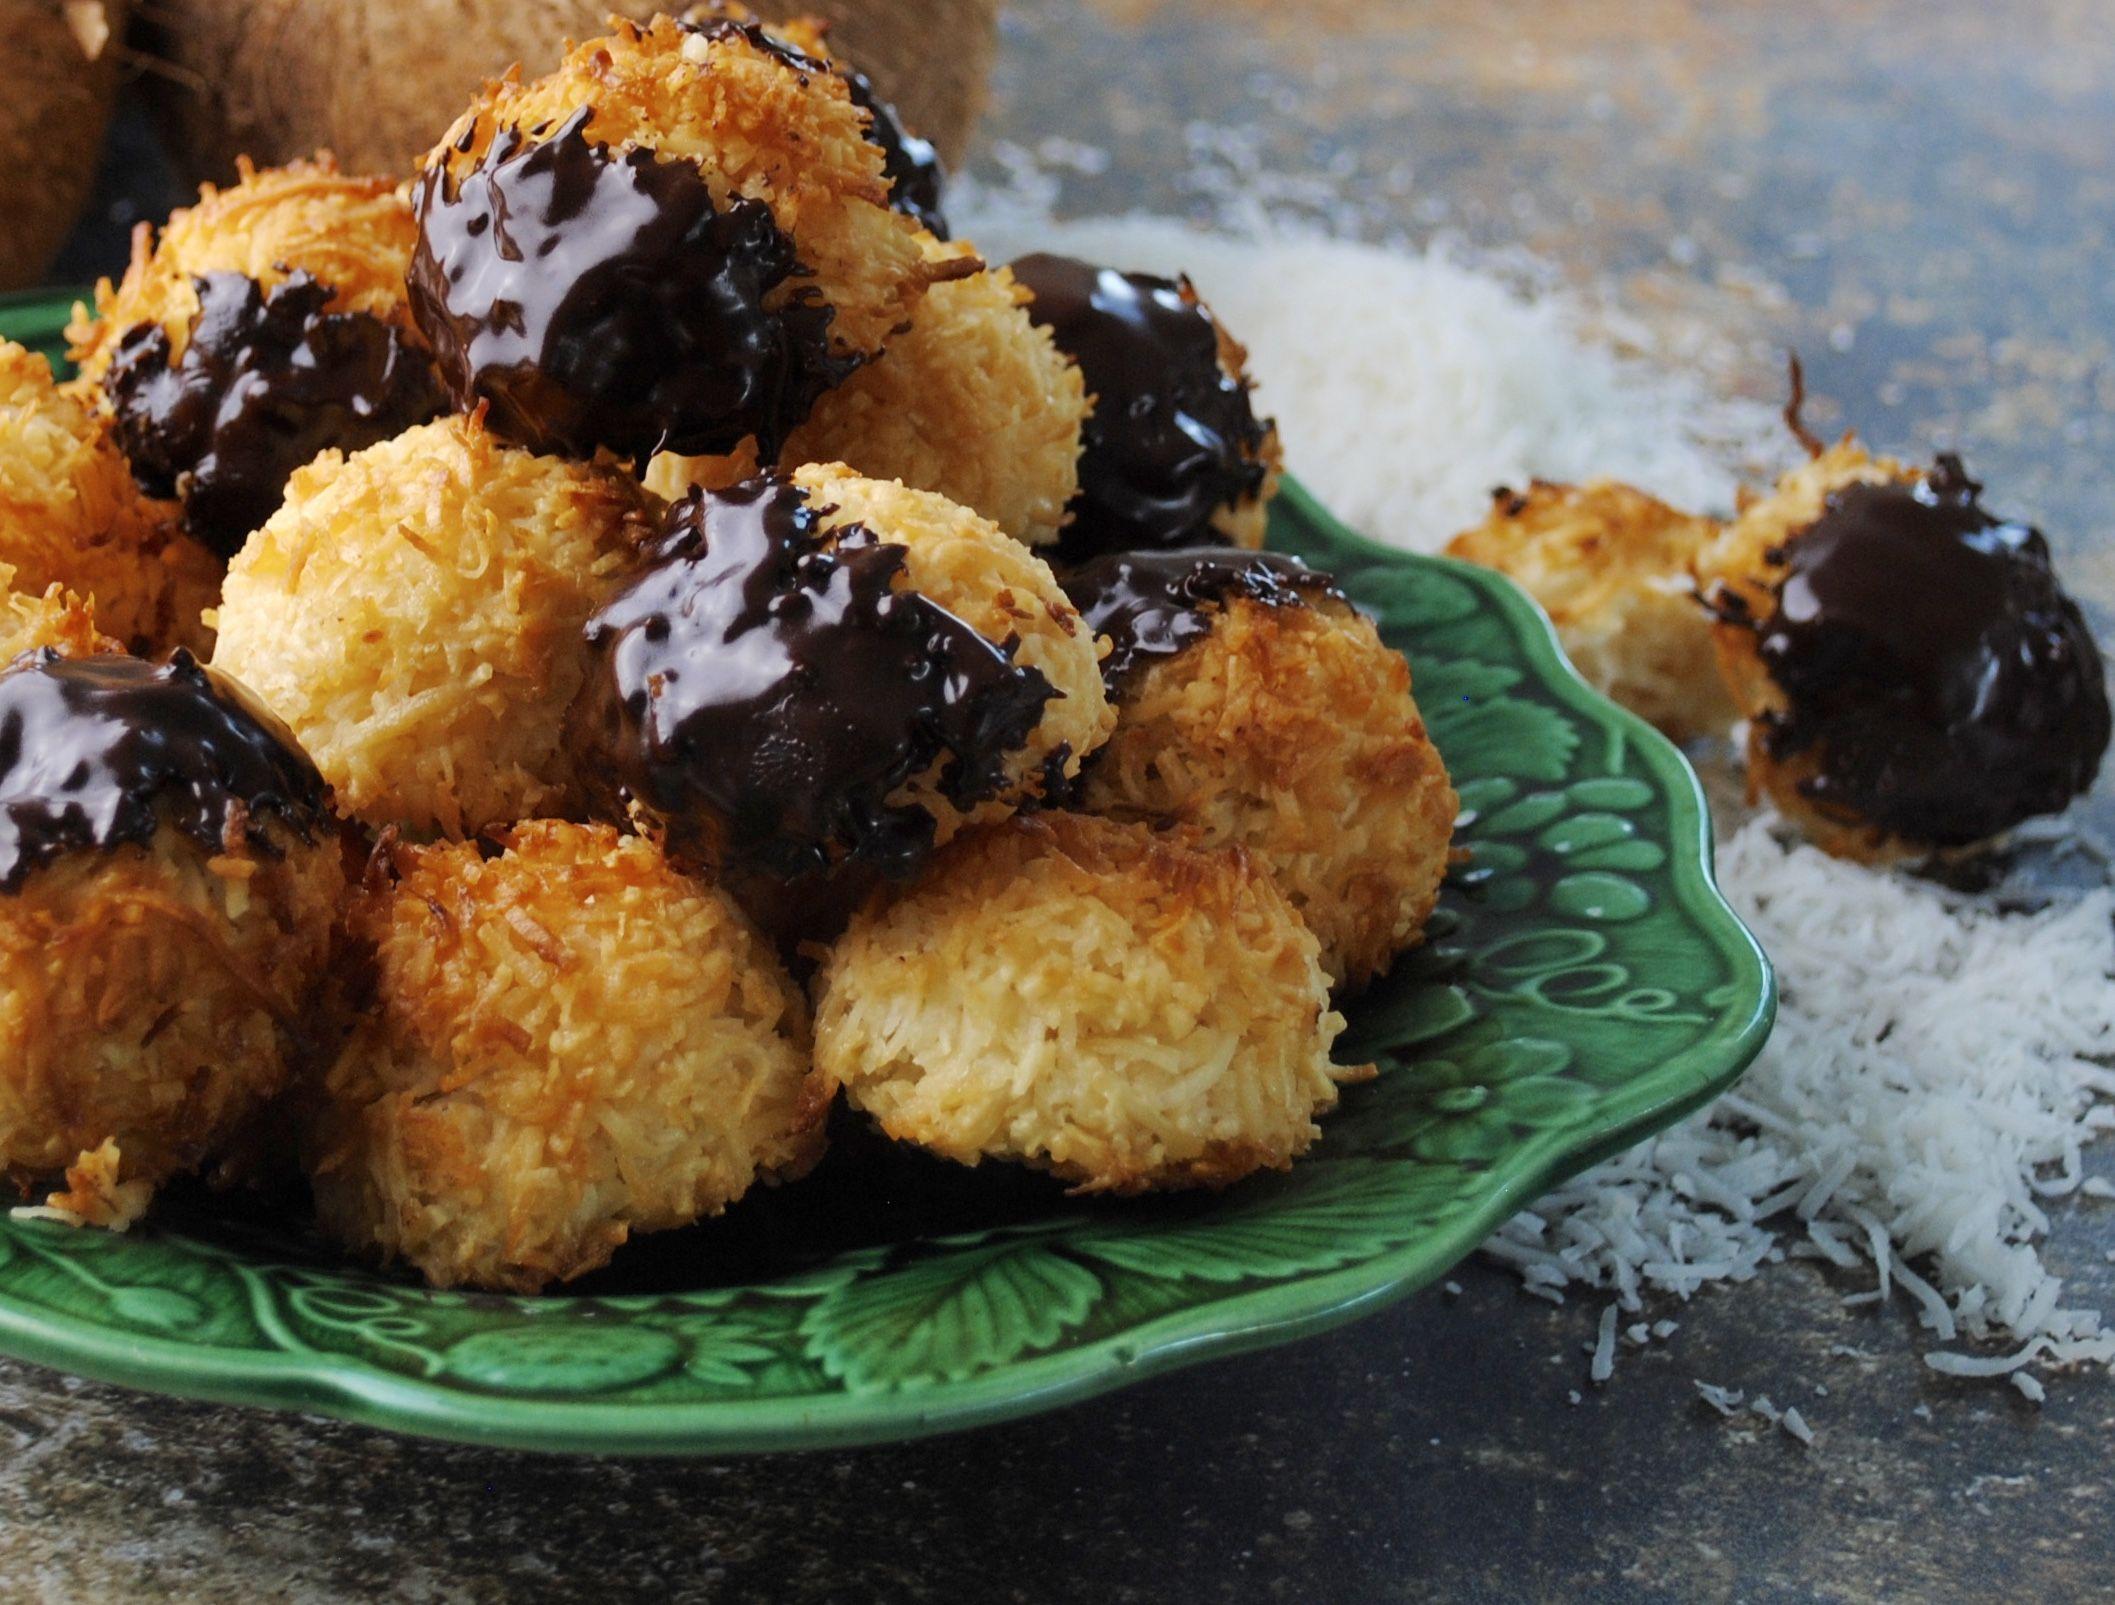 Coconut Macaroons Recipe In 2020 Macaroon Recipes Coconut Macaroons